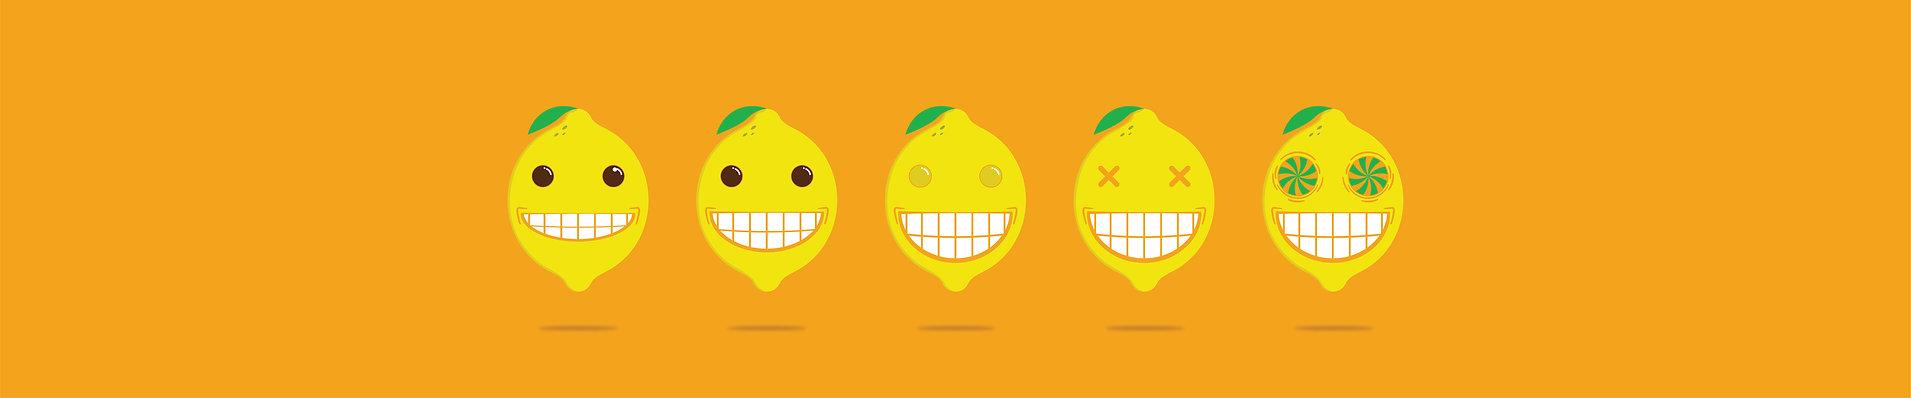 Lemonhead_Banneroranj.jpg